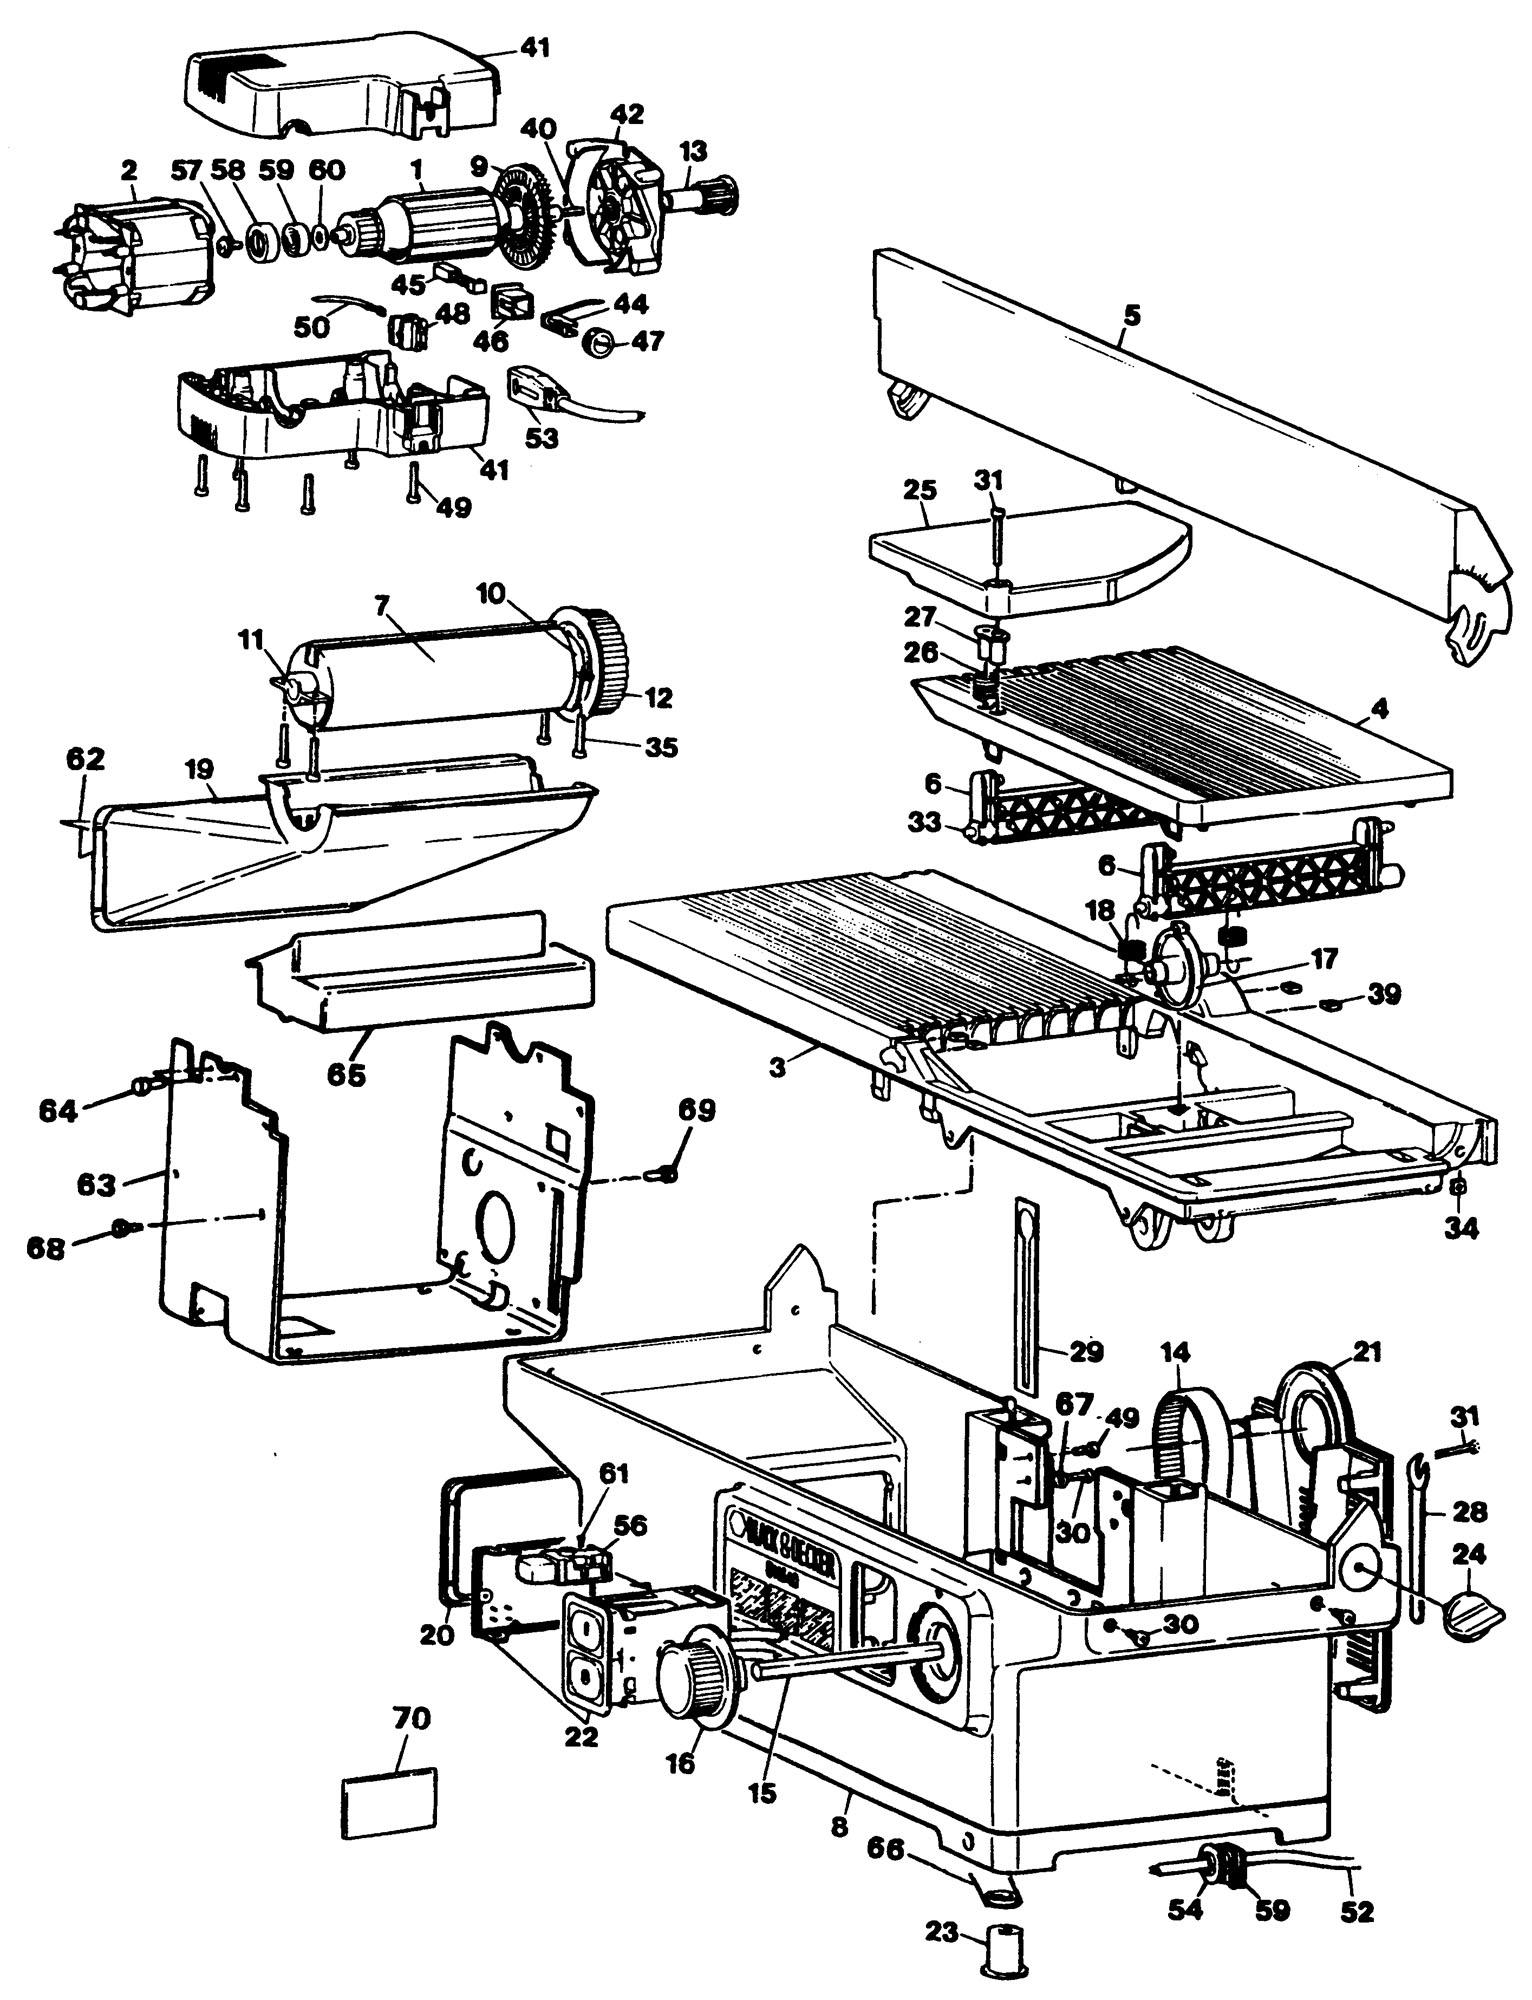 Spares For Black Amp Decker Dn840 Bench Planer Type 1